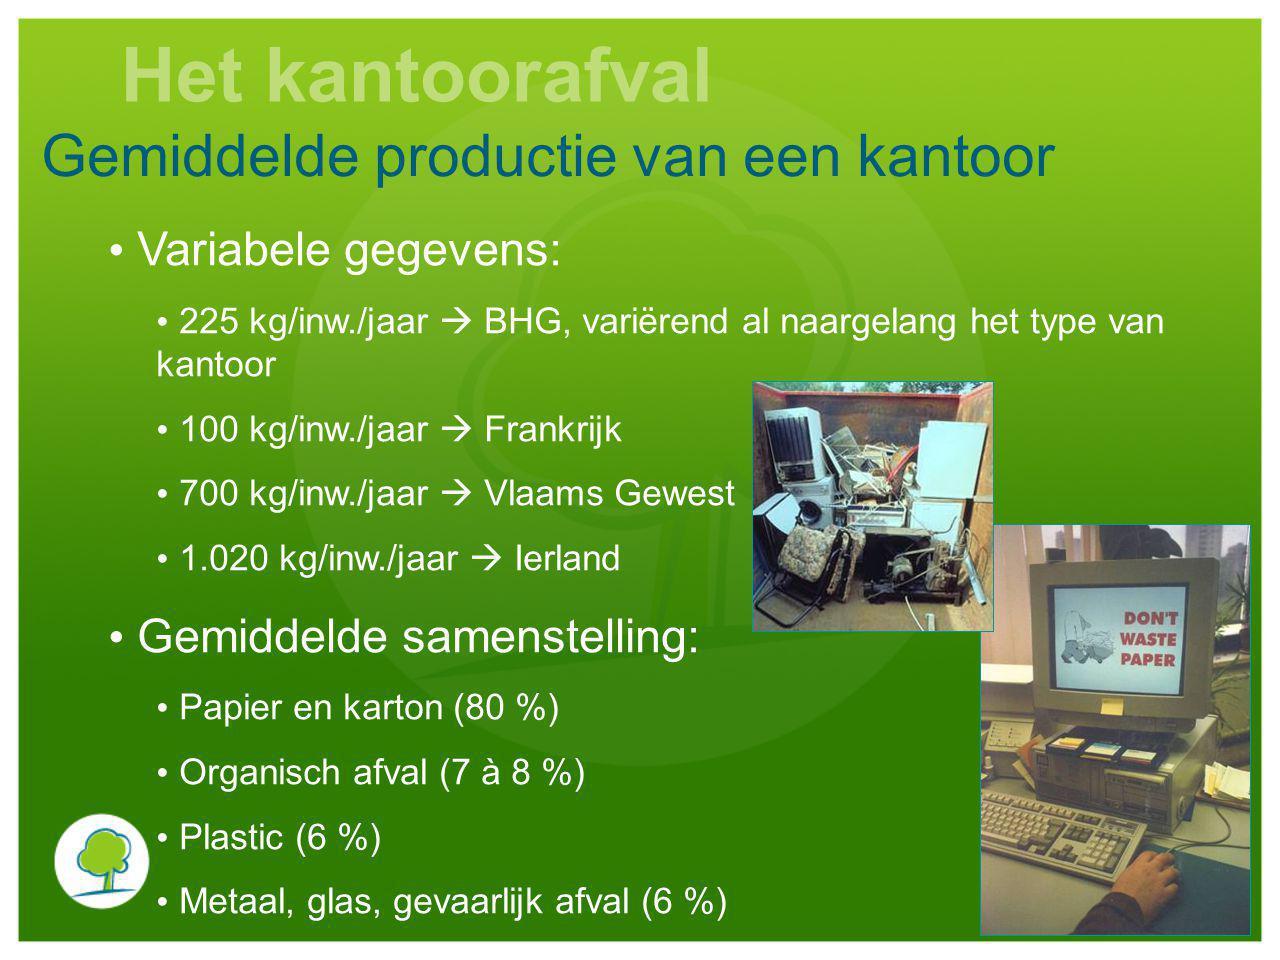 Gemiddelde productie van een kantoor Variabele gegevens: 225 kg/inw./jaar  BHG, variërend al naargelang het type van kantoor 100 kg/inw./jaar  Frankrijk 700 kg/inw./jaar  Vlaams Gewest 1.020 kg/inw./jaar  Ierland Gemiddelde samenstelling: Papier en karton (80 %) Organisch afval (7 à 8 %) Plastic (6 %) Metaal, glas, gevaarlijk afval (6 %)